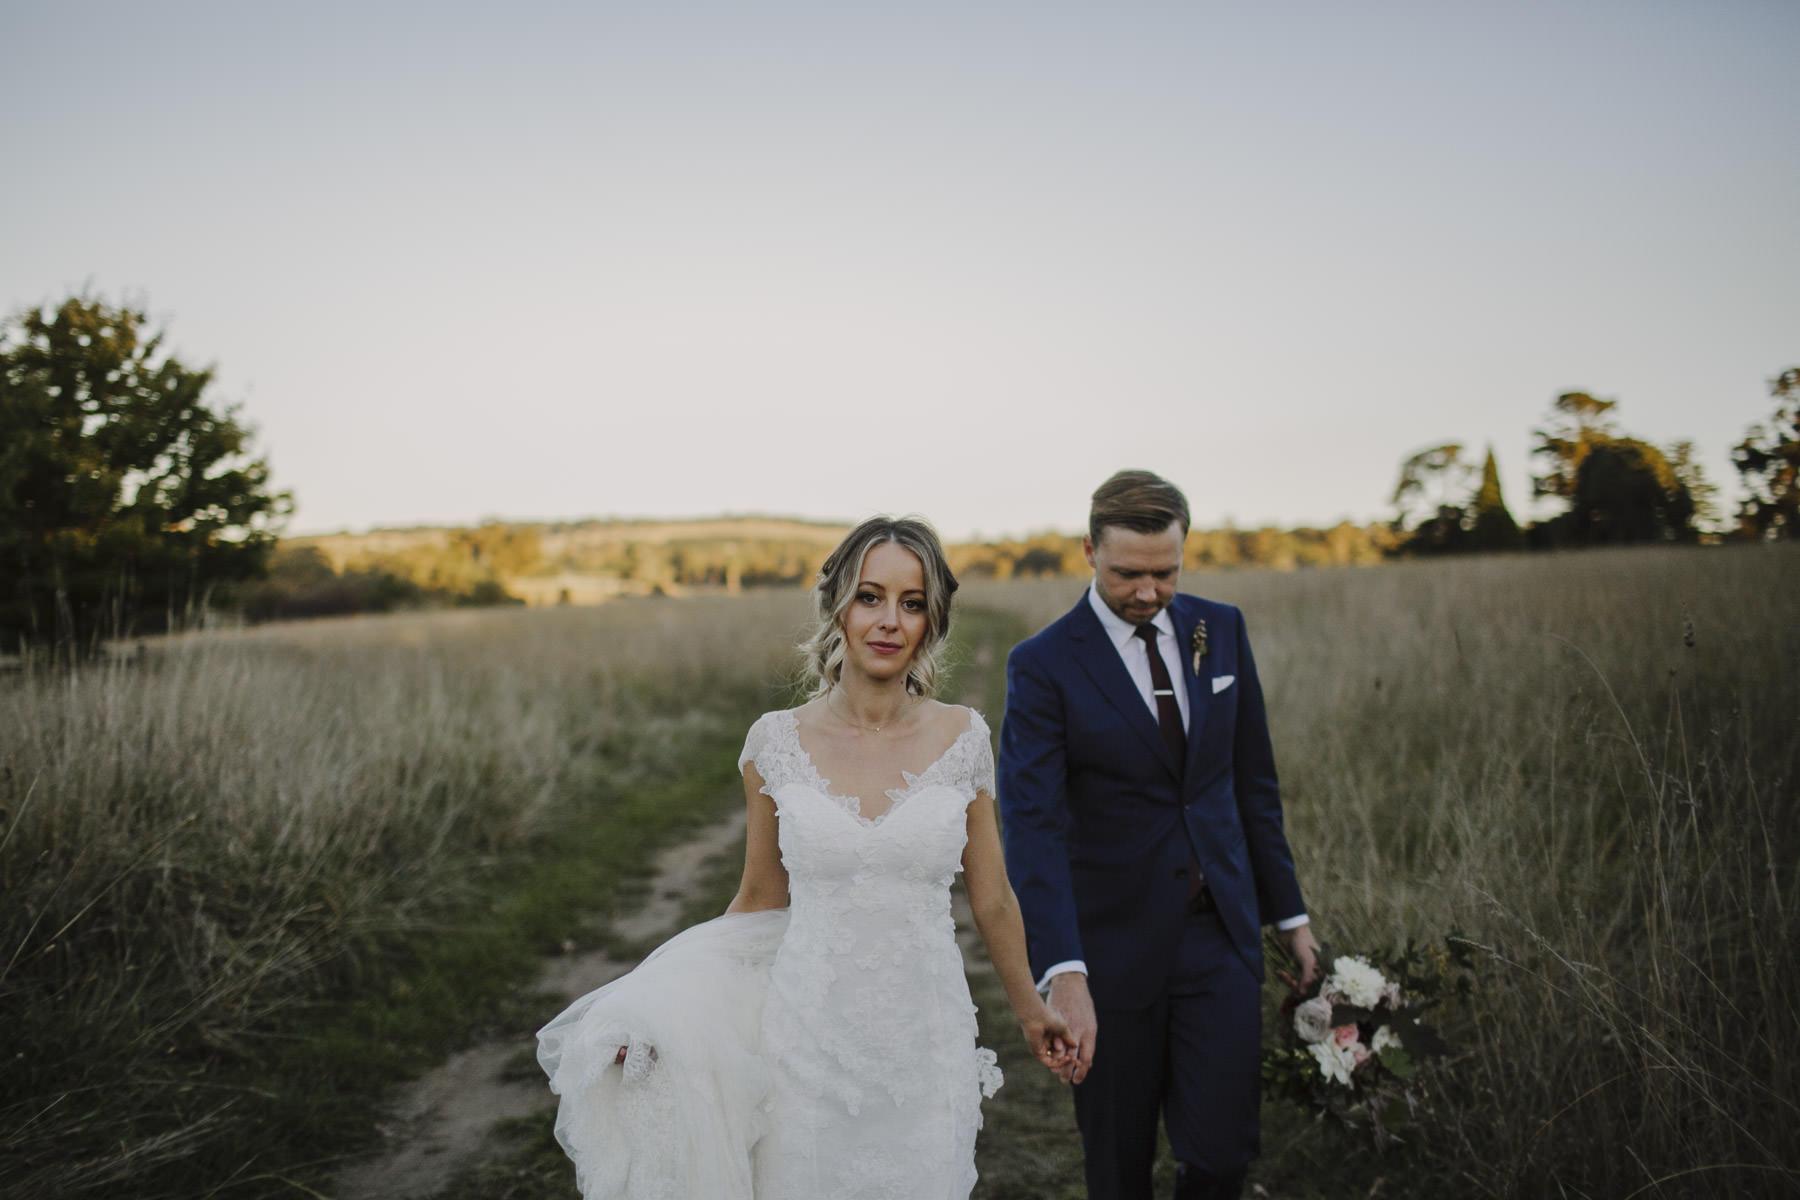 160506_justinaaron_wedding_holly_daniel_pr-191.jpg